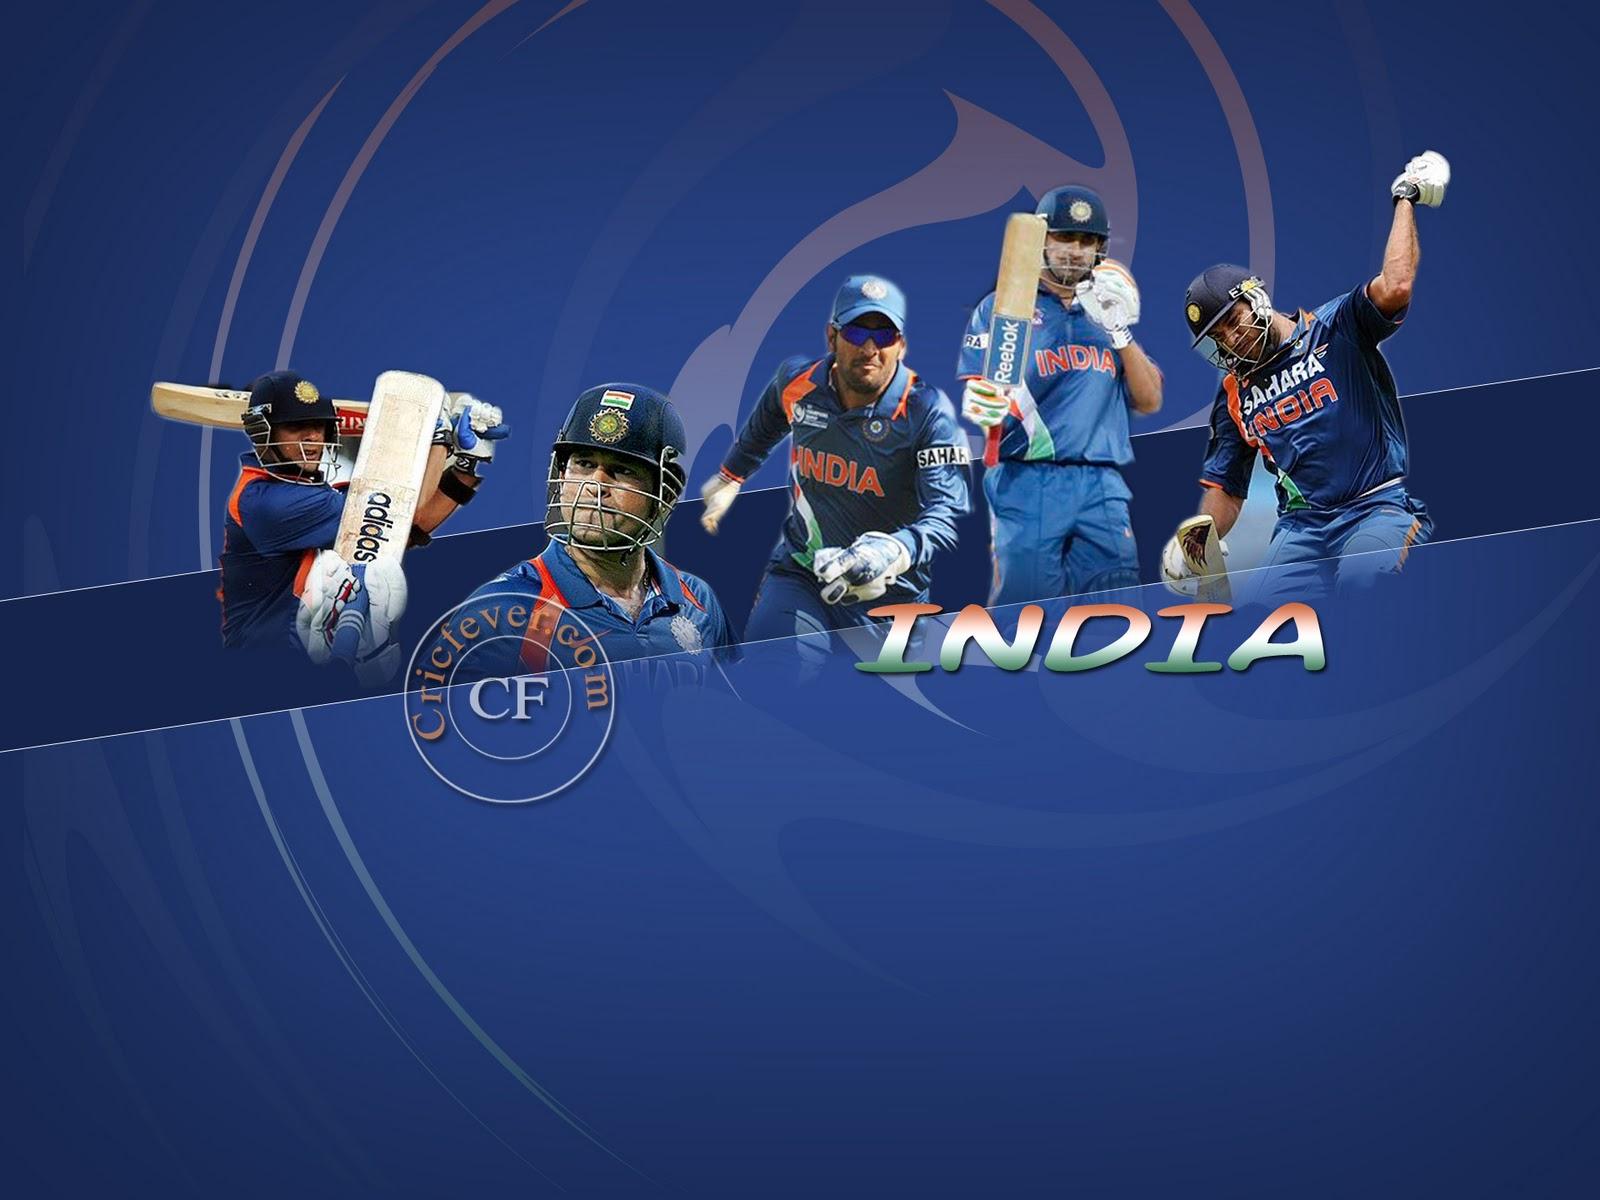 http://3.bp.blogspot.com/-WG2GsaabTQE/TWn-DJ2_X6I/AAAAAAAAAFM/EbmAZ6S8RBg/s1600/Team_India_for_icc_world_cup_wallpapers.jpg